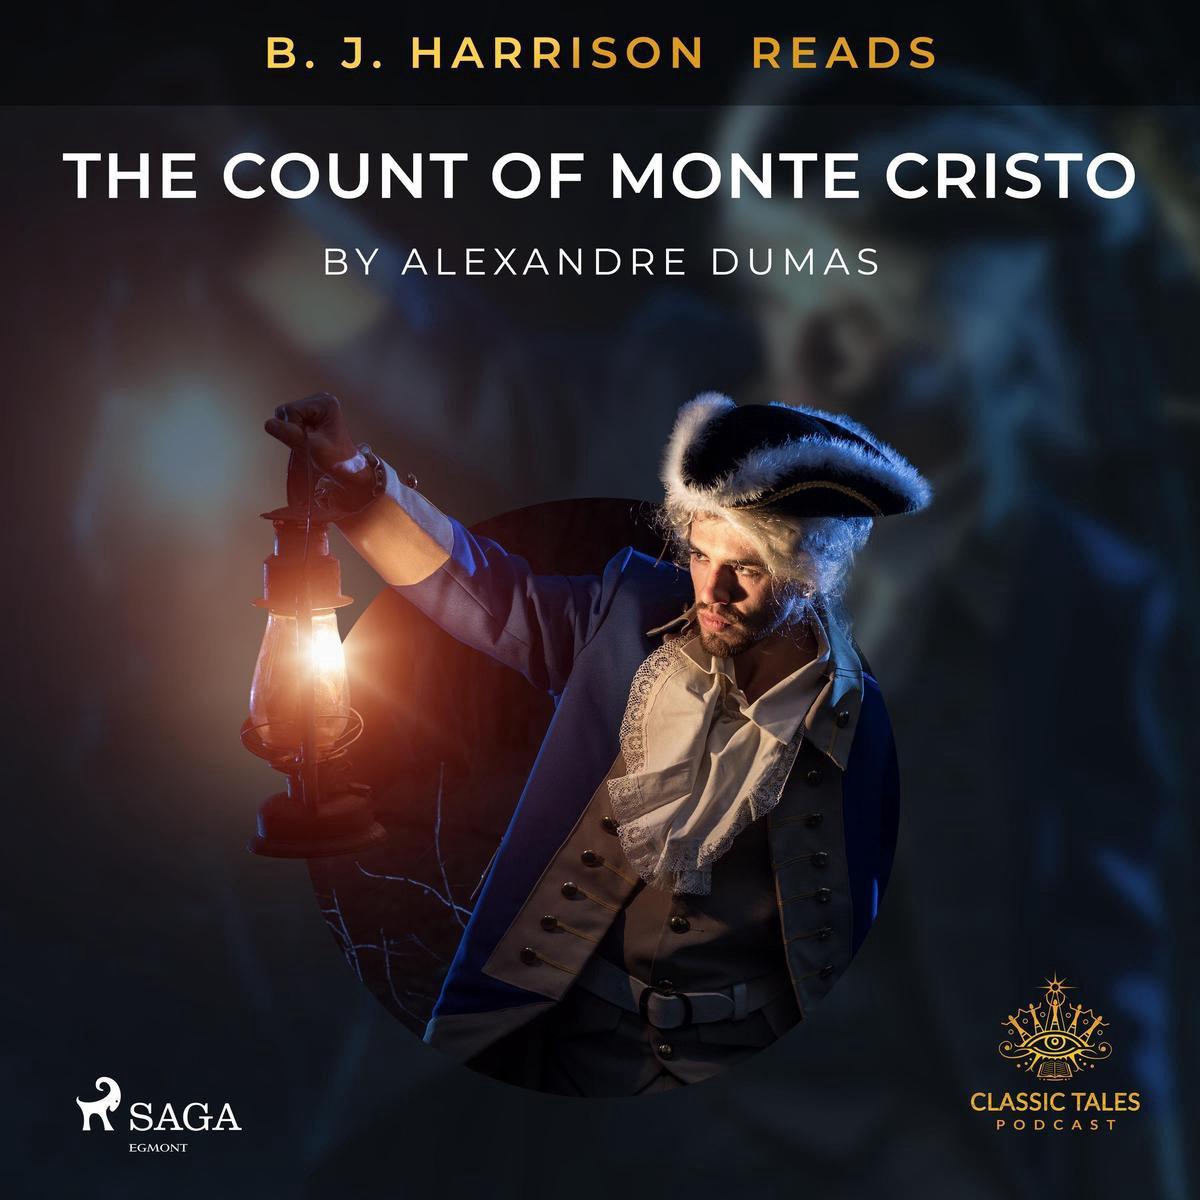 B. J. Harrison Reads The Count of Monte Cristo